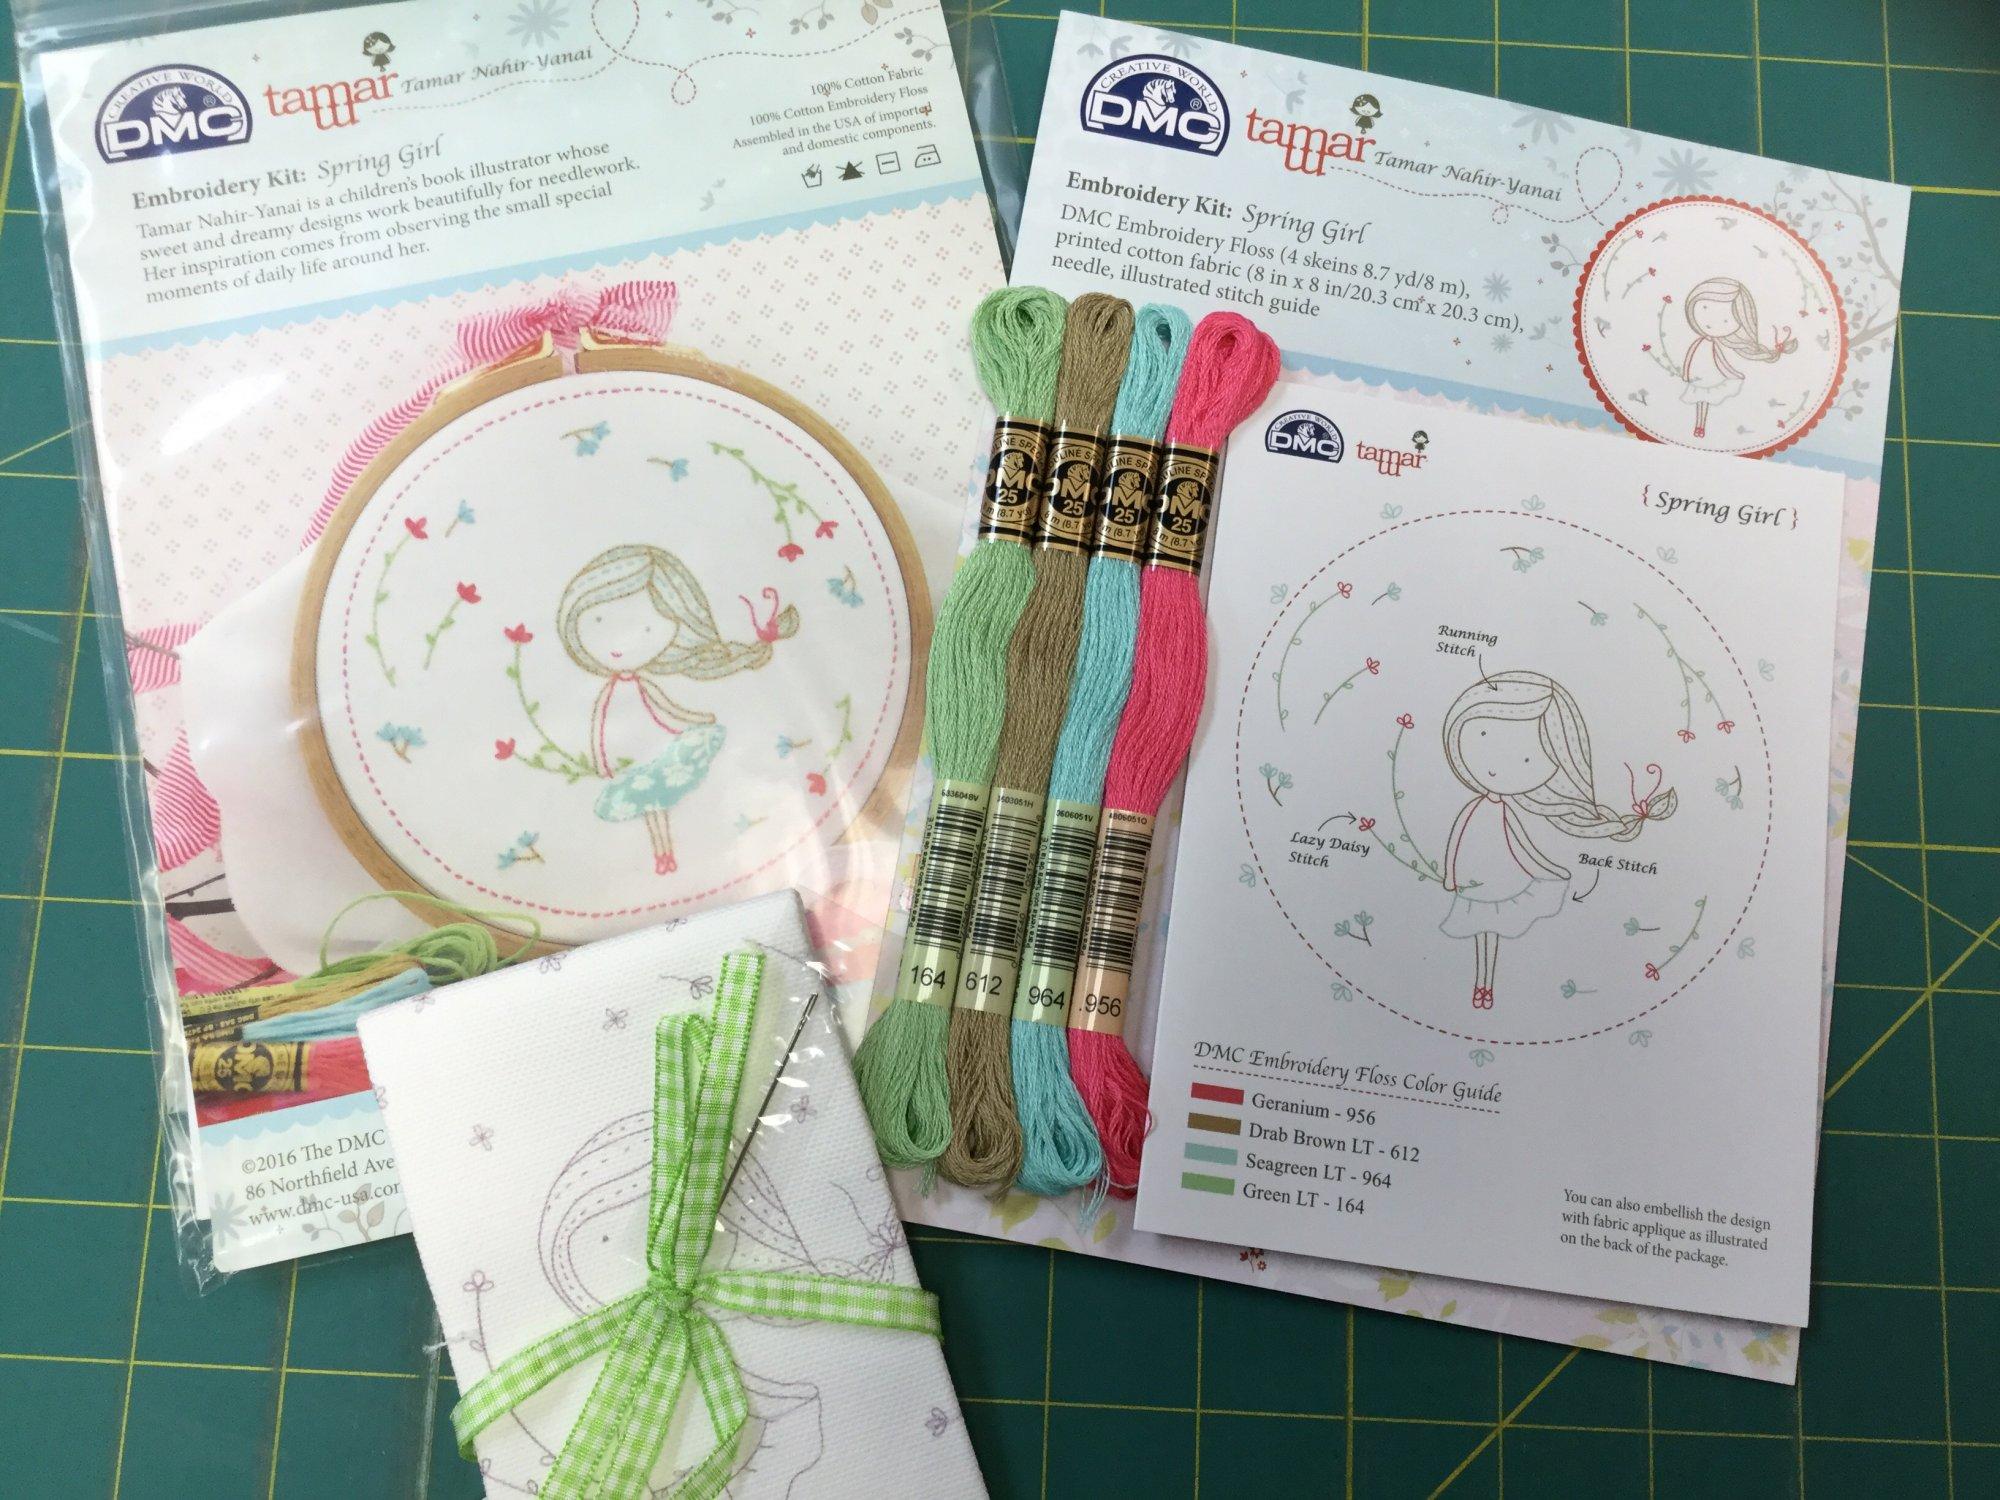 Spring Girl Embroidery Kit DMC